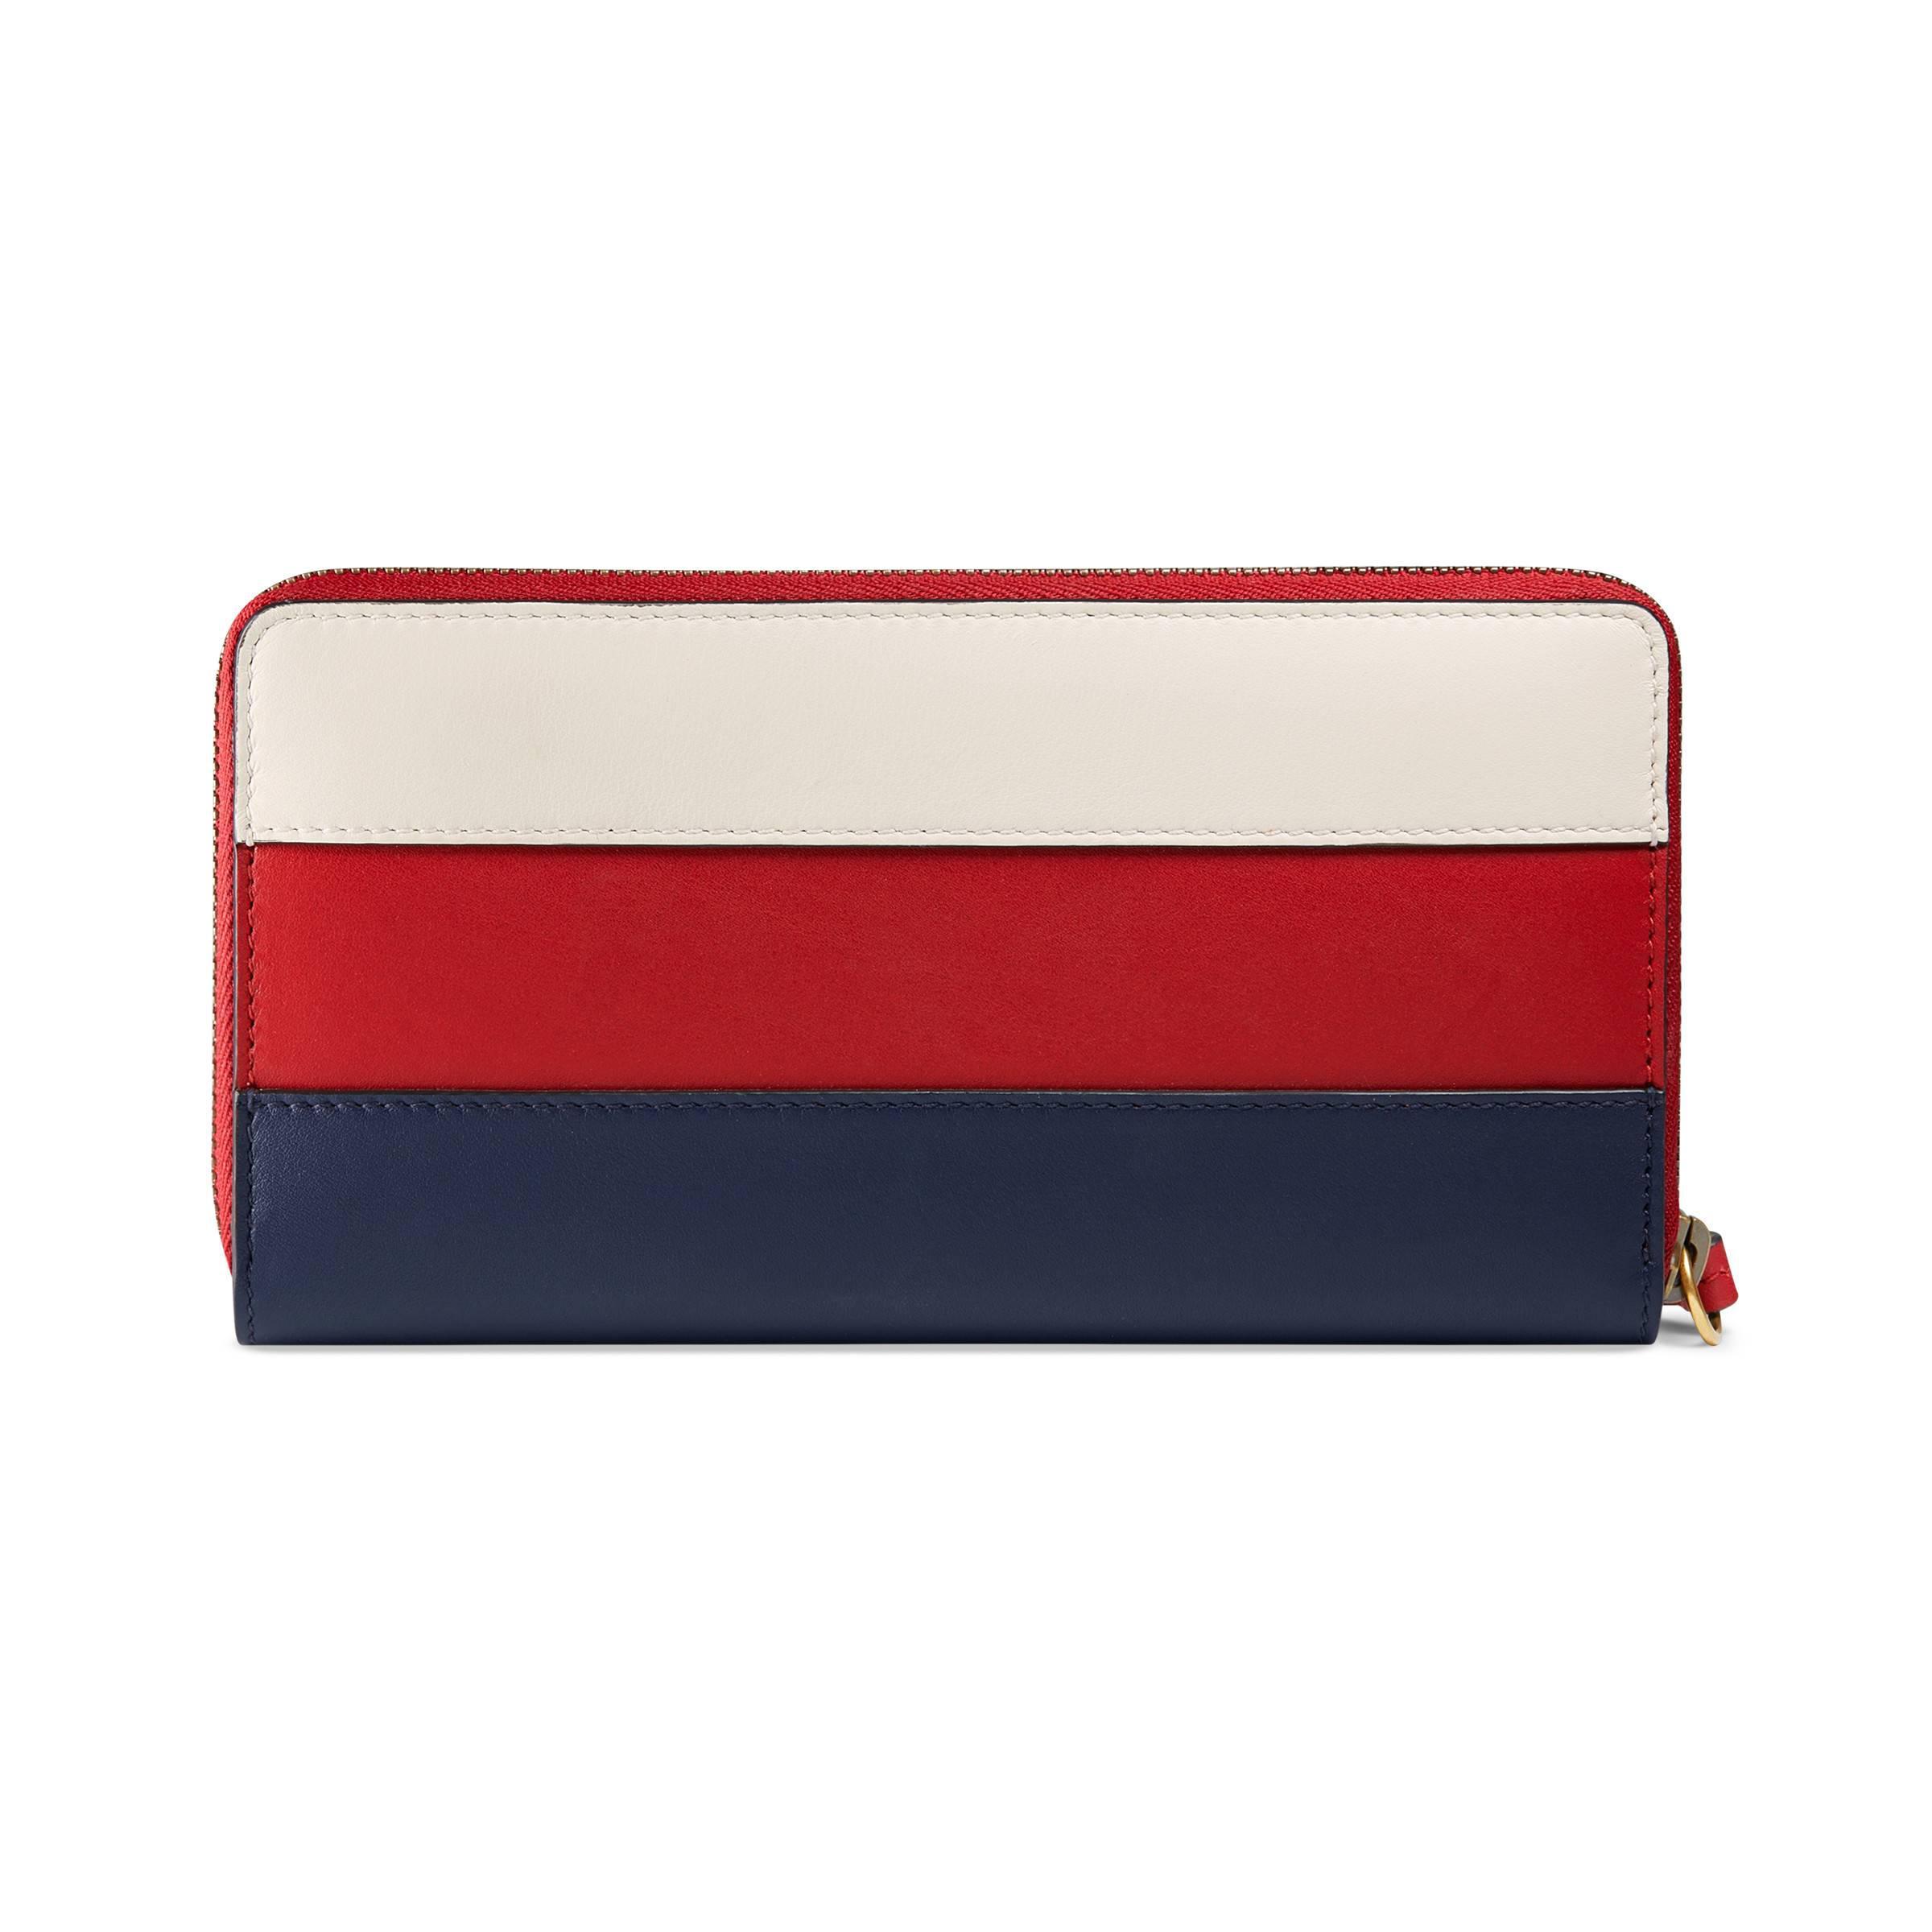 33f1fca48cdd Gucci Queen Margaret Leather Zip Around Wallet in Red - Lyst